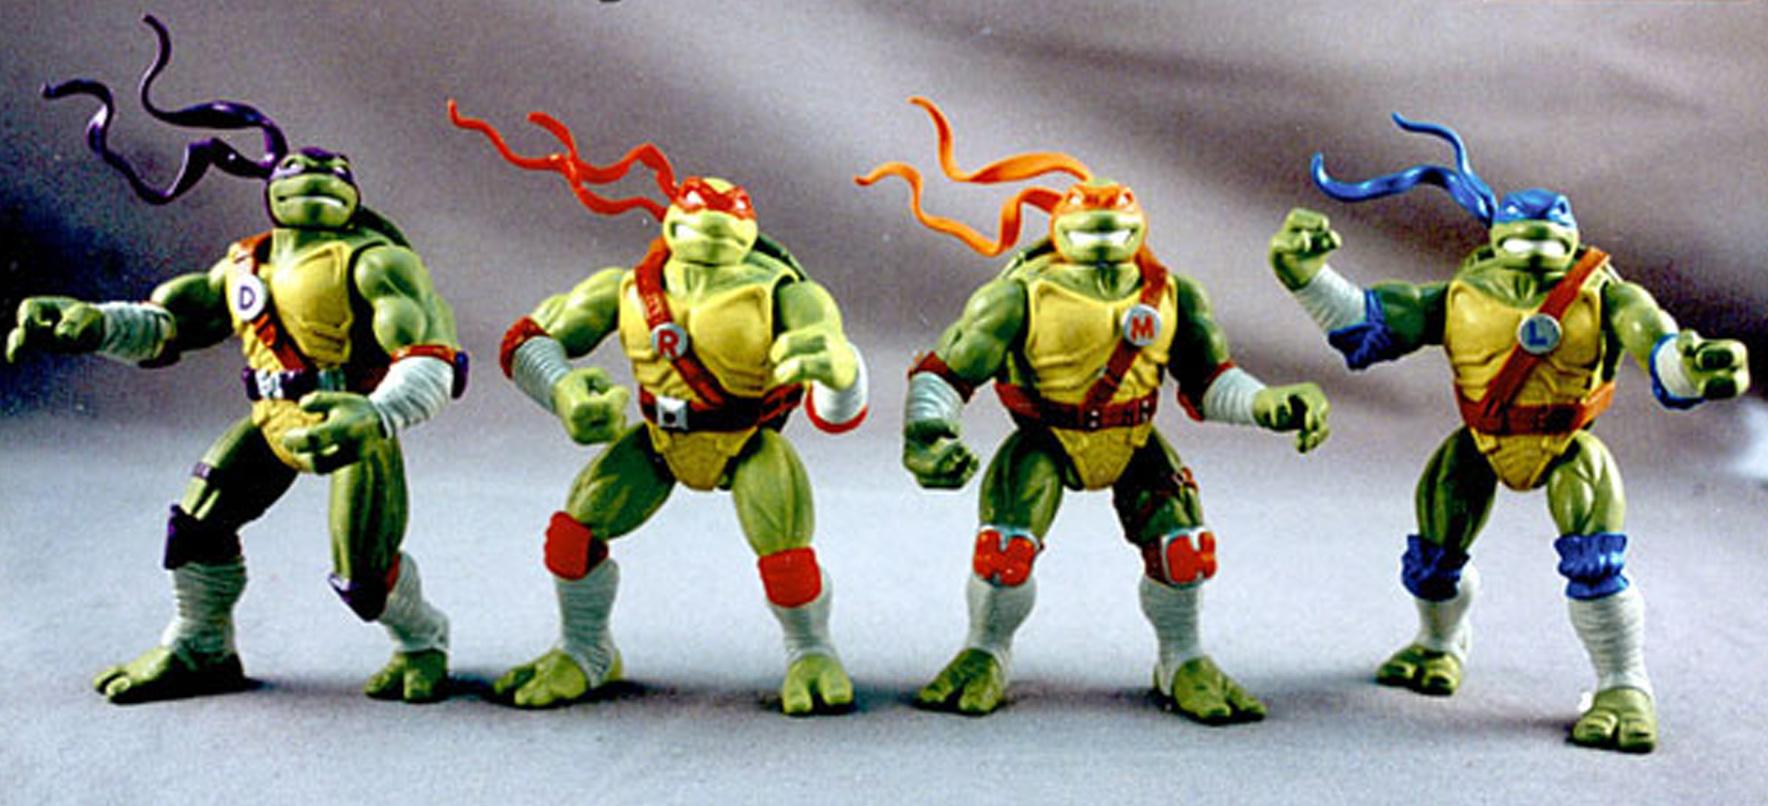 the Teenage Mutant Ninja Turtles - articulated figures for Playmates toys